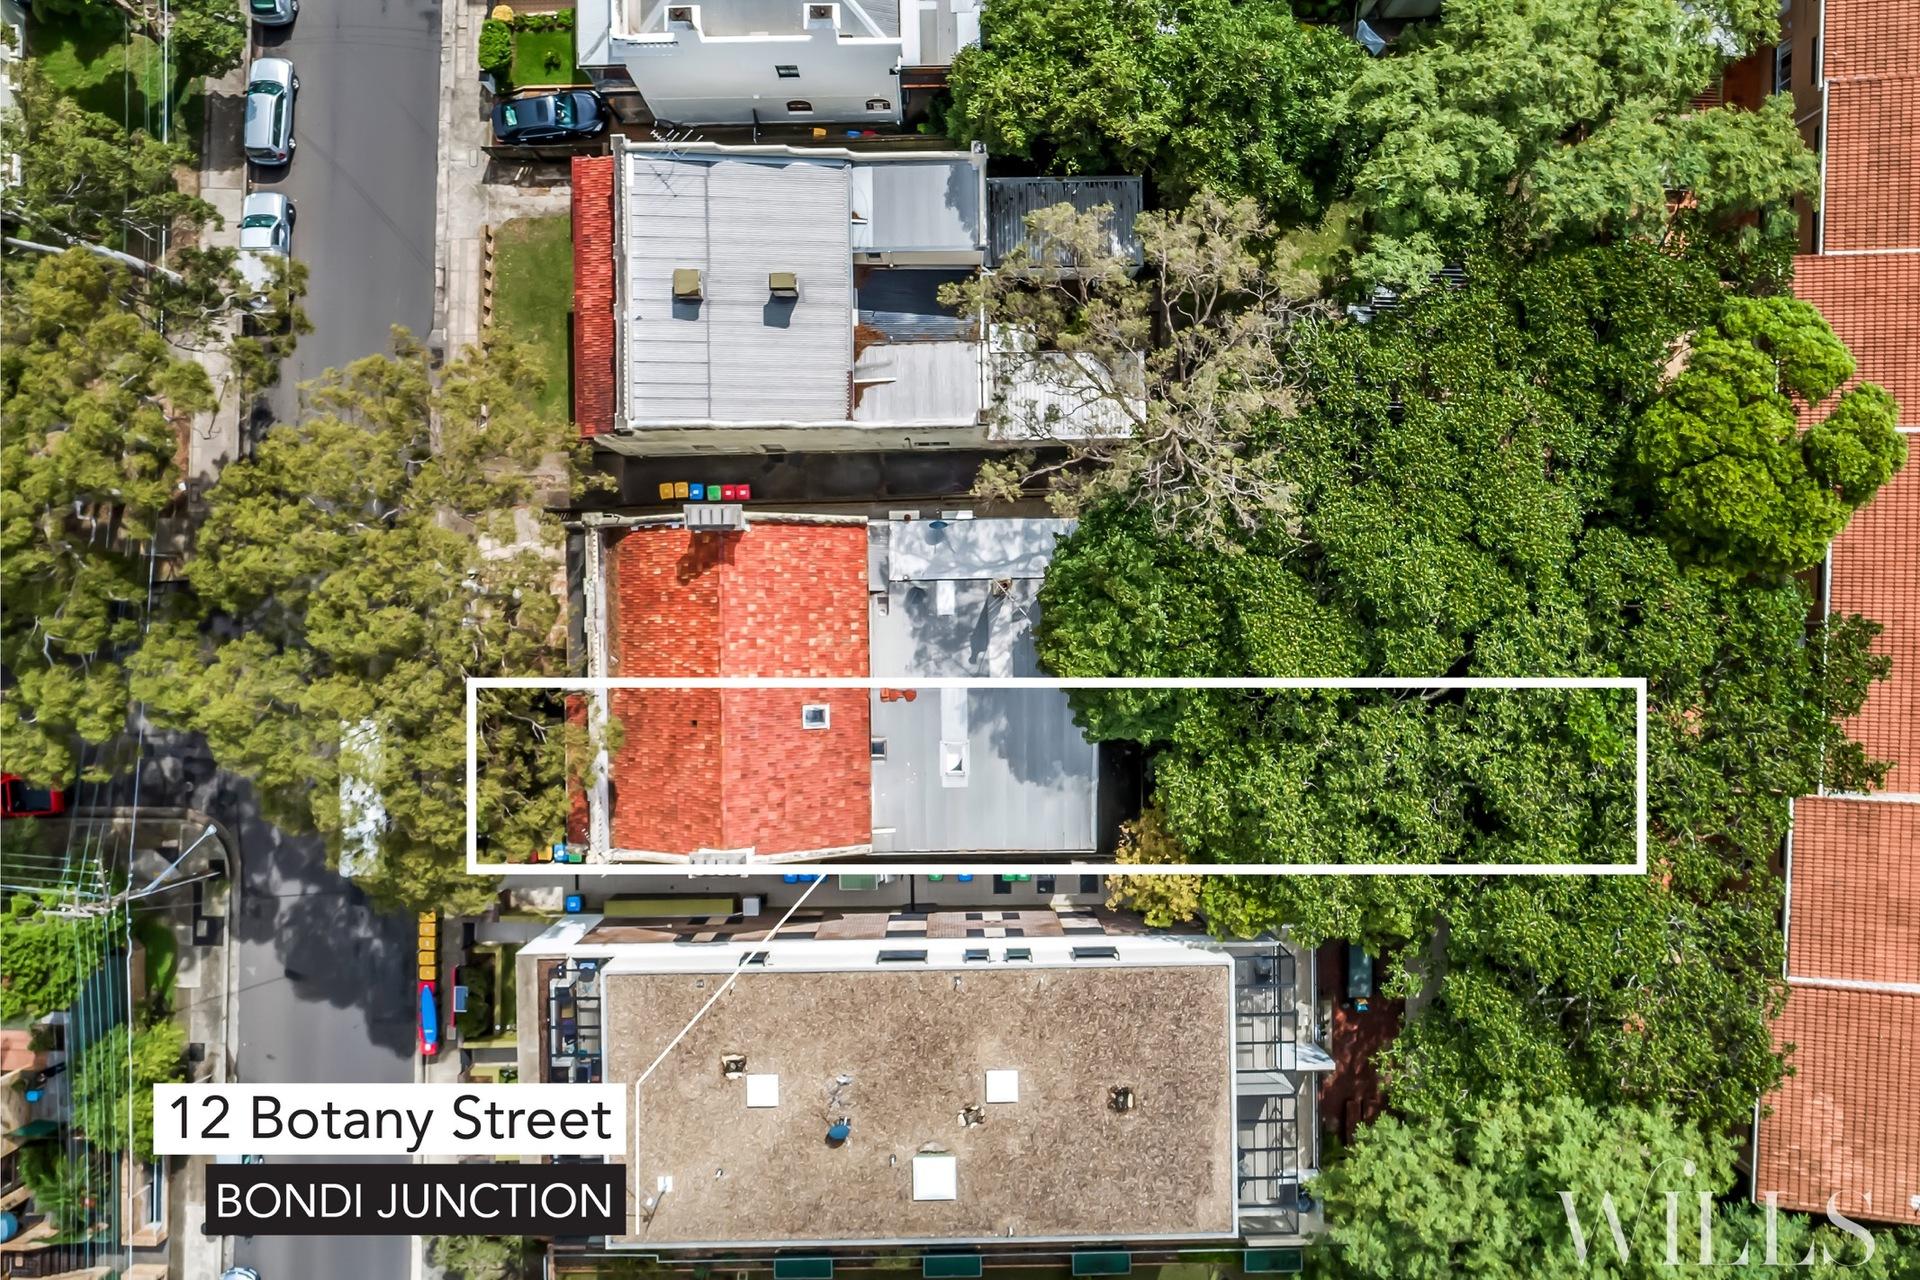 12 Botany Street Bondi Junction